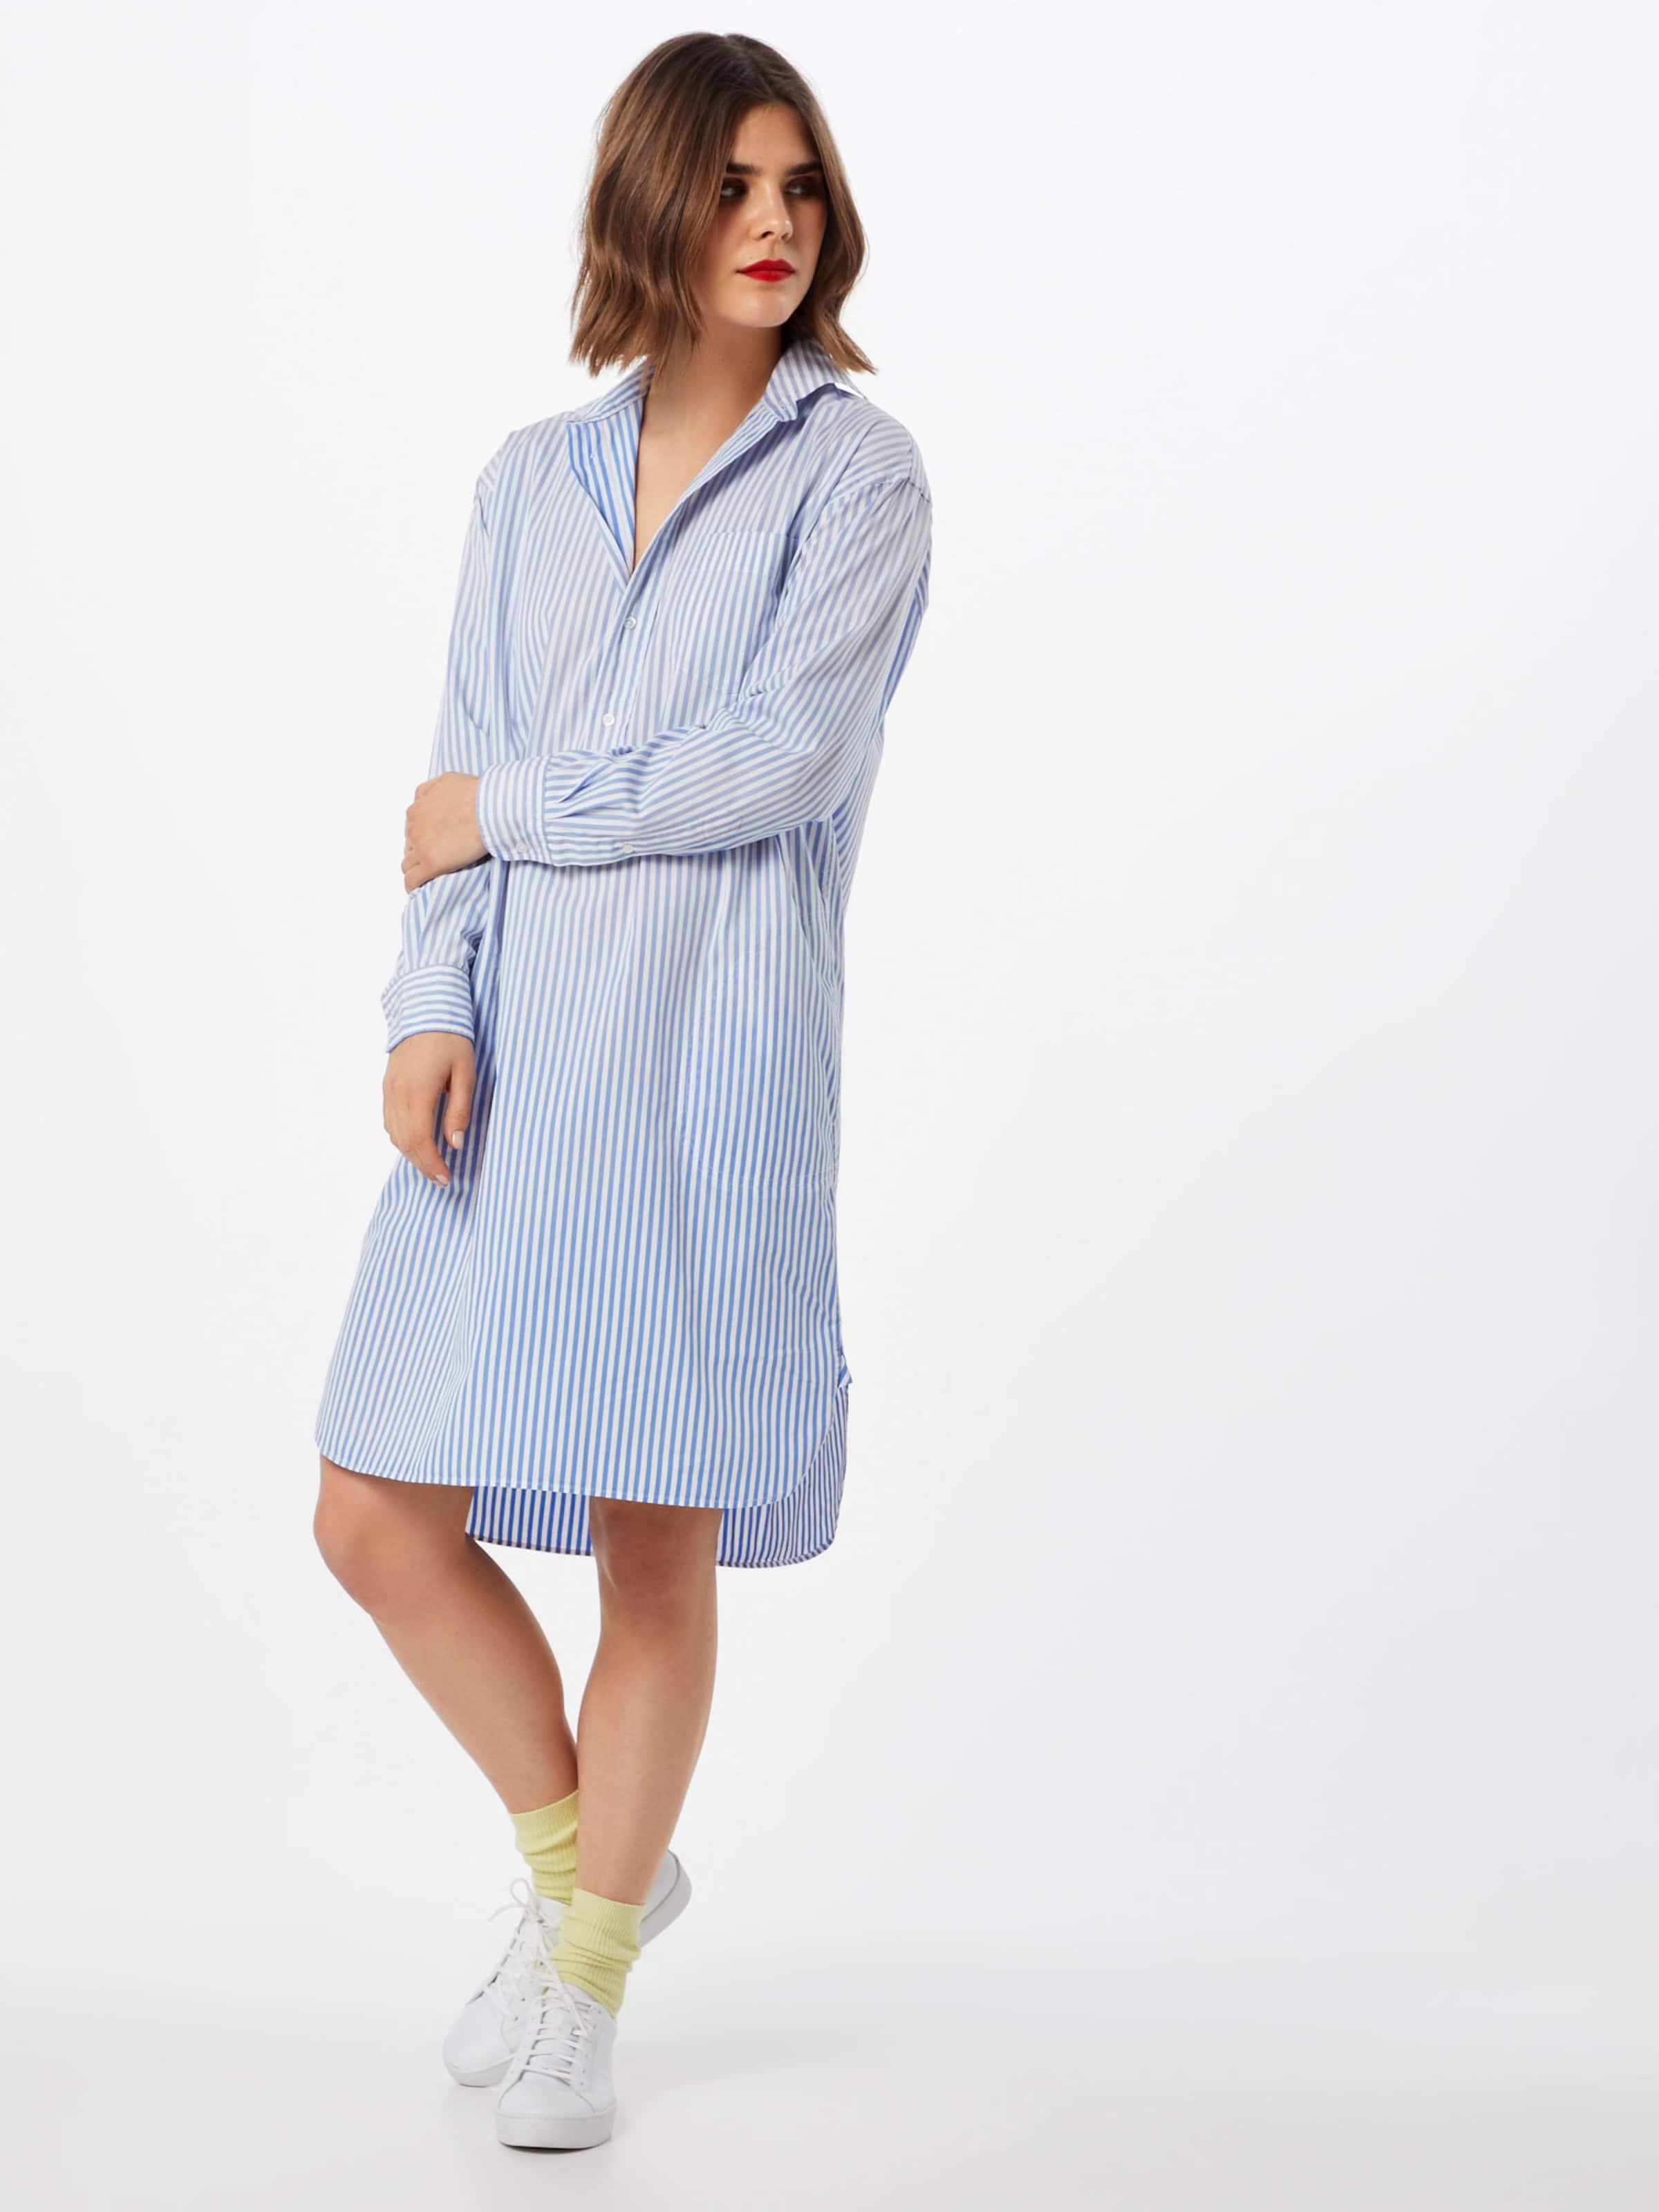 BleuBlanc Ralph En Lauren Polo Robe chemise QBexWECrdo